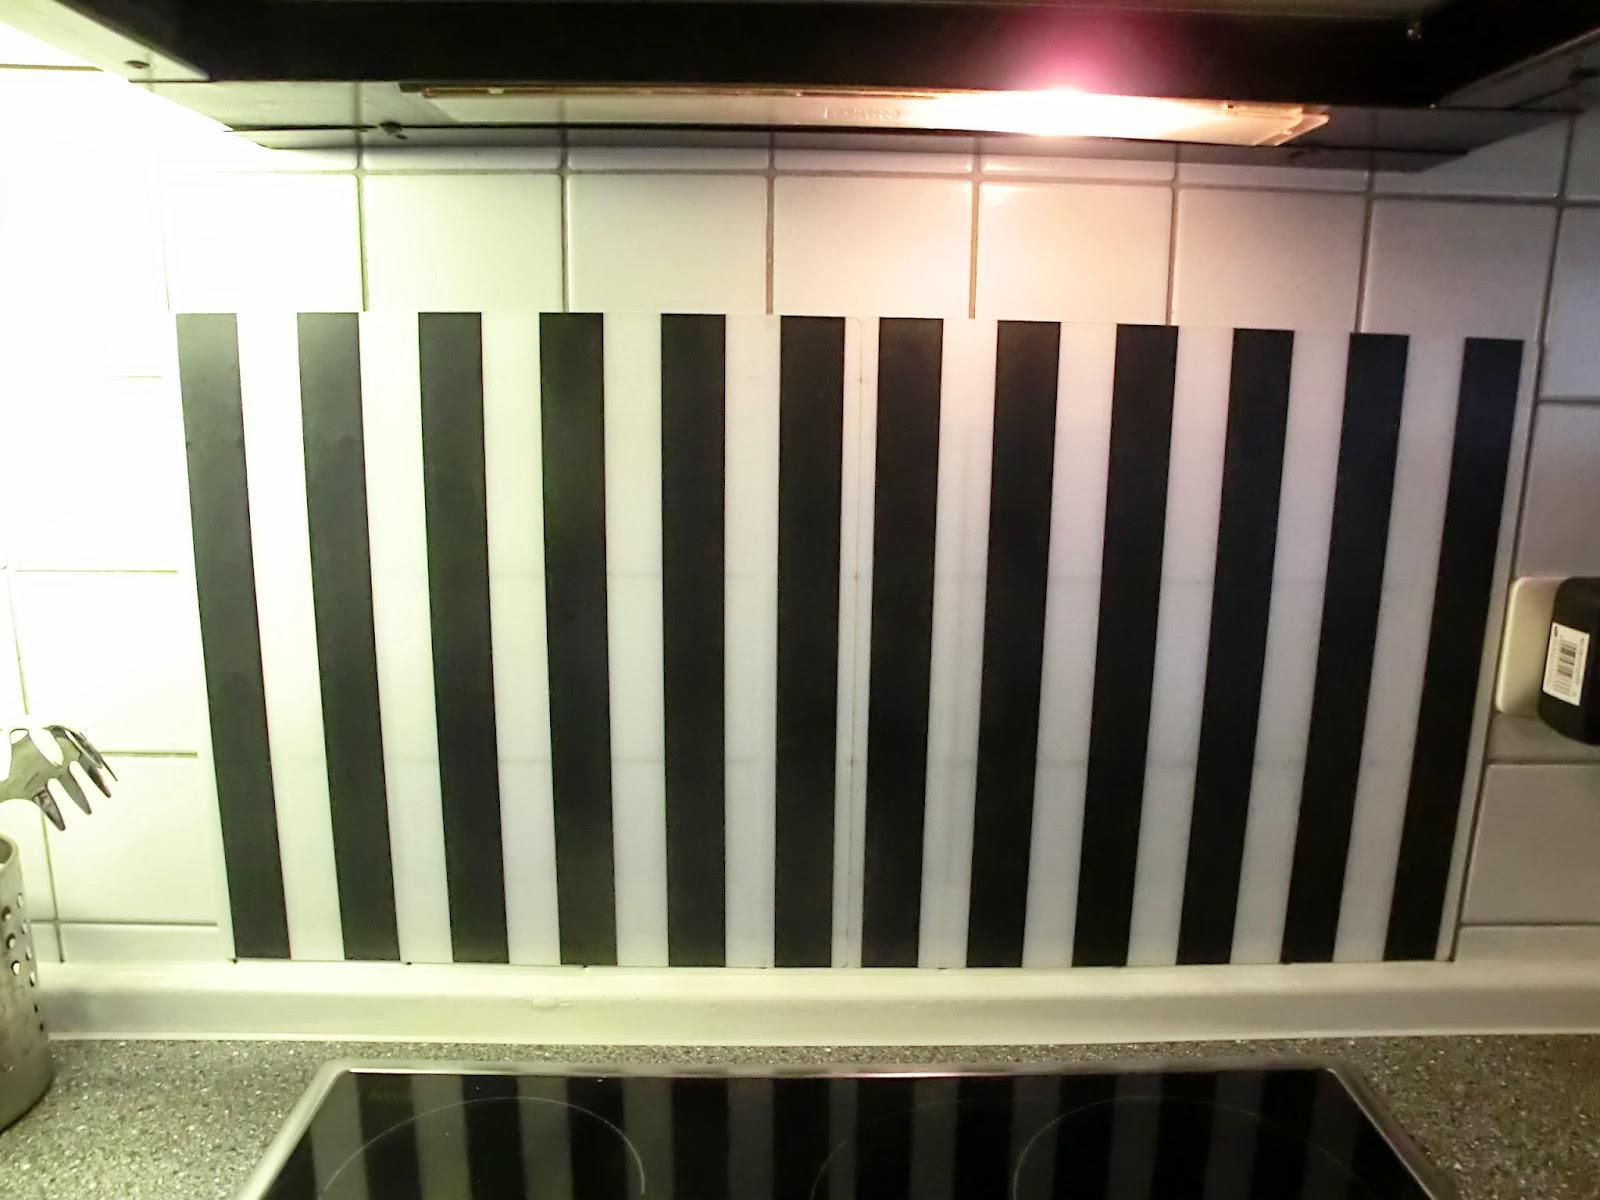 bastelirium do it yourself spritzschutz k che. Black Bedroom Furniture Sets. Home Design Ideas